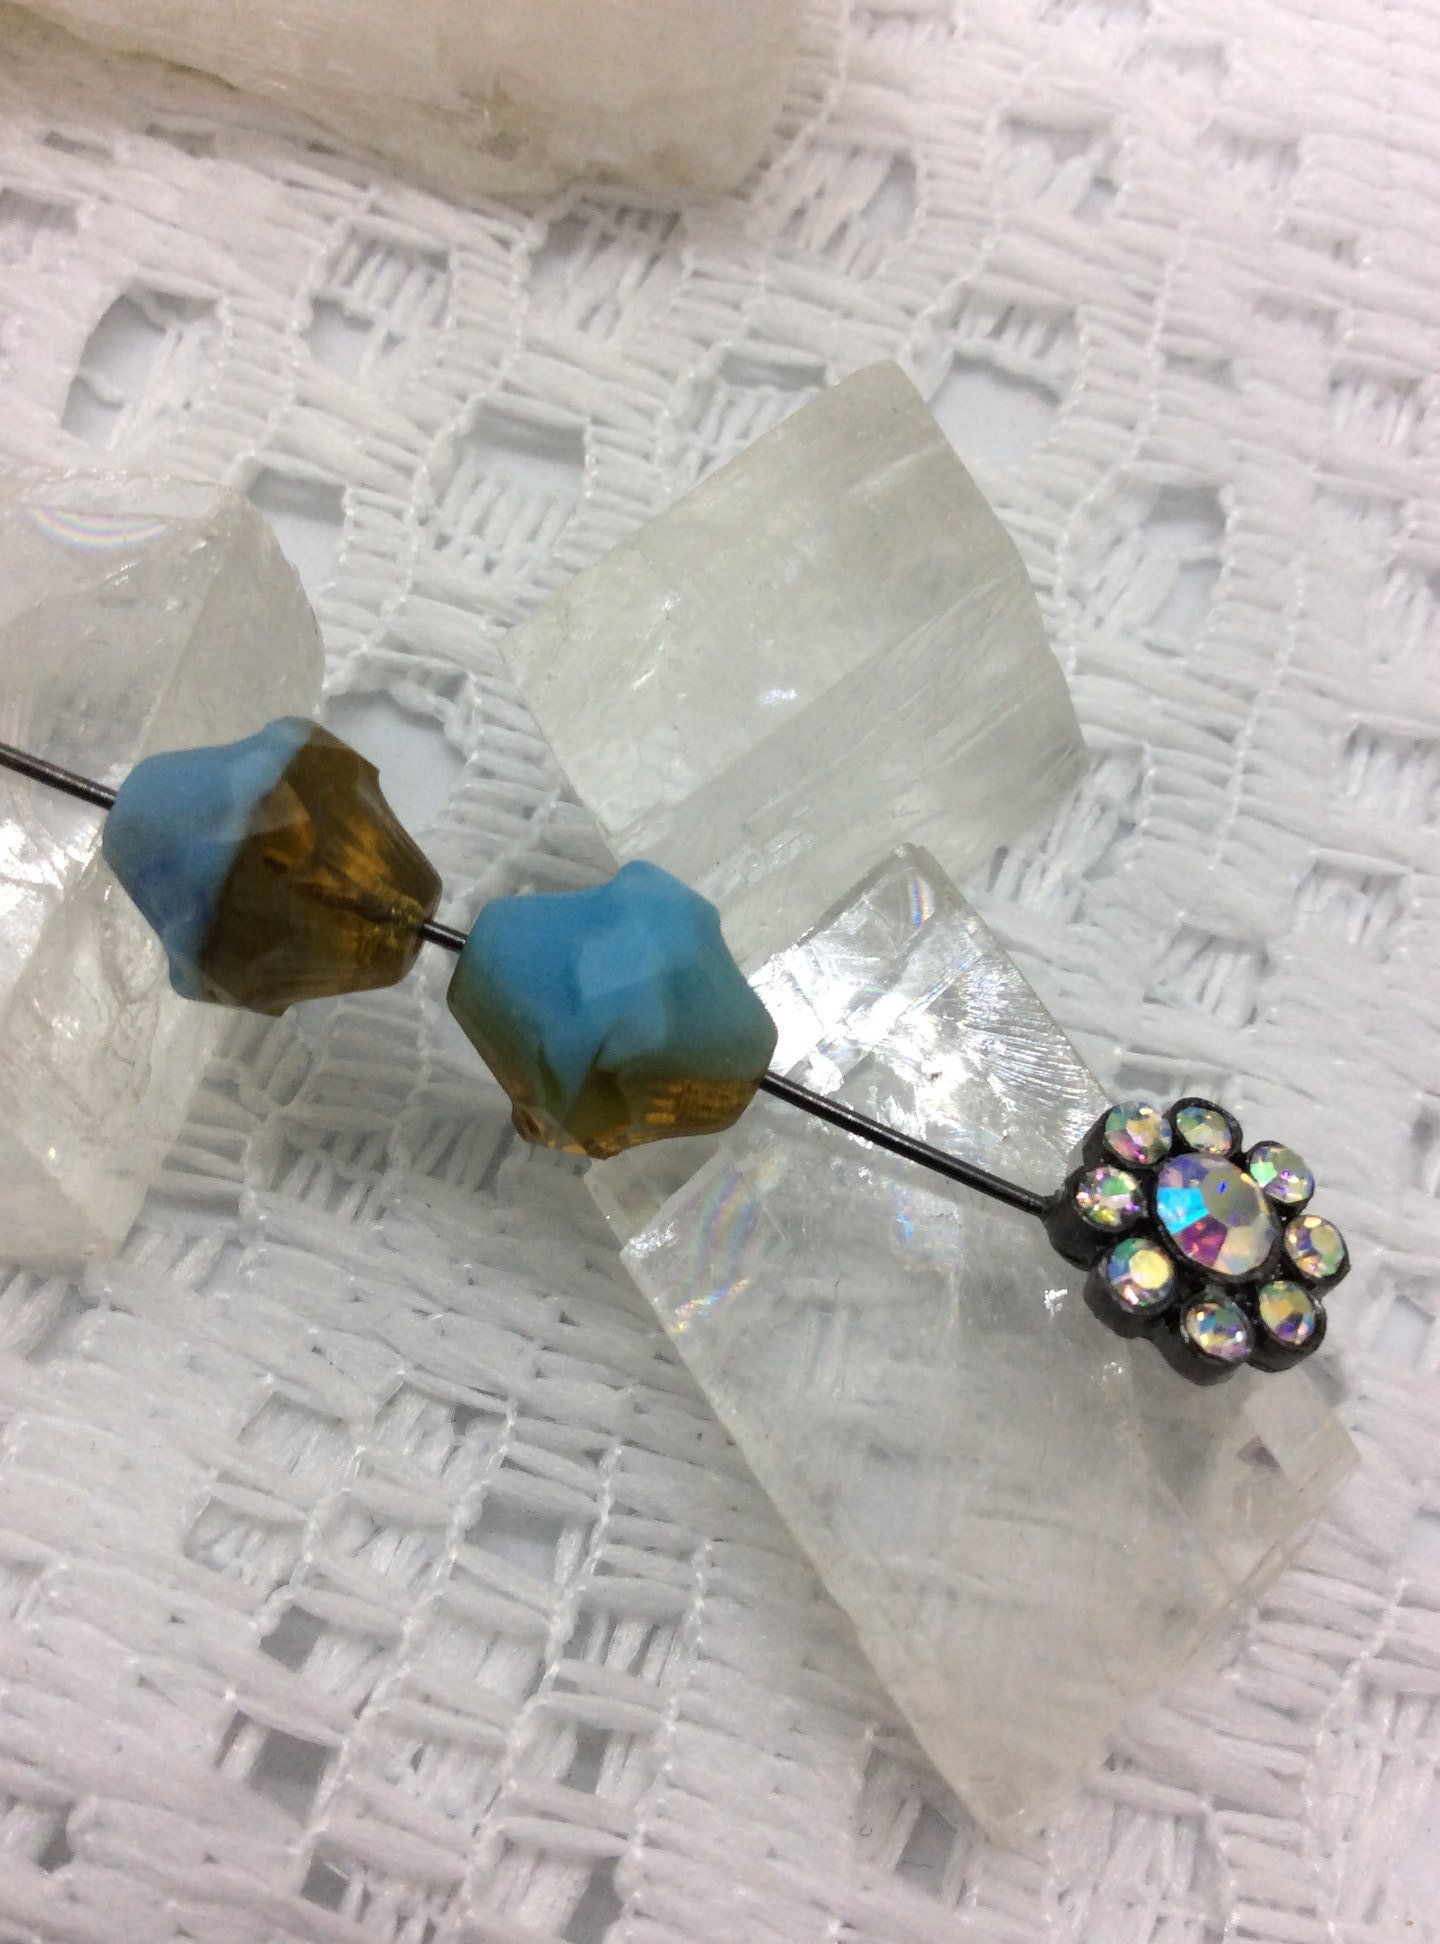 11x10 mm fire polished Czech glass  15 TURBINE  beads